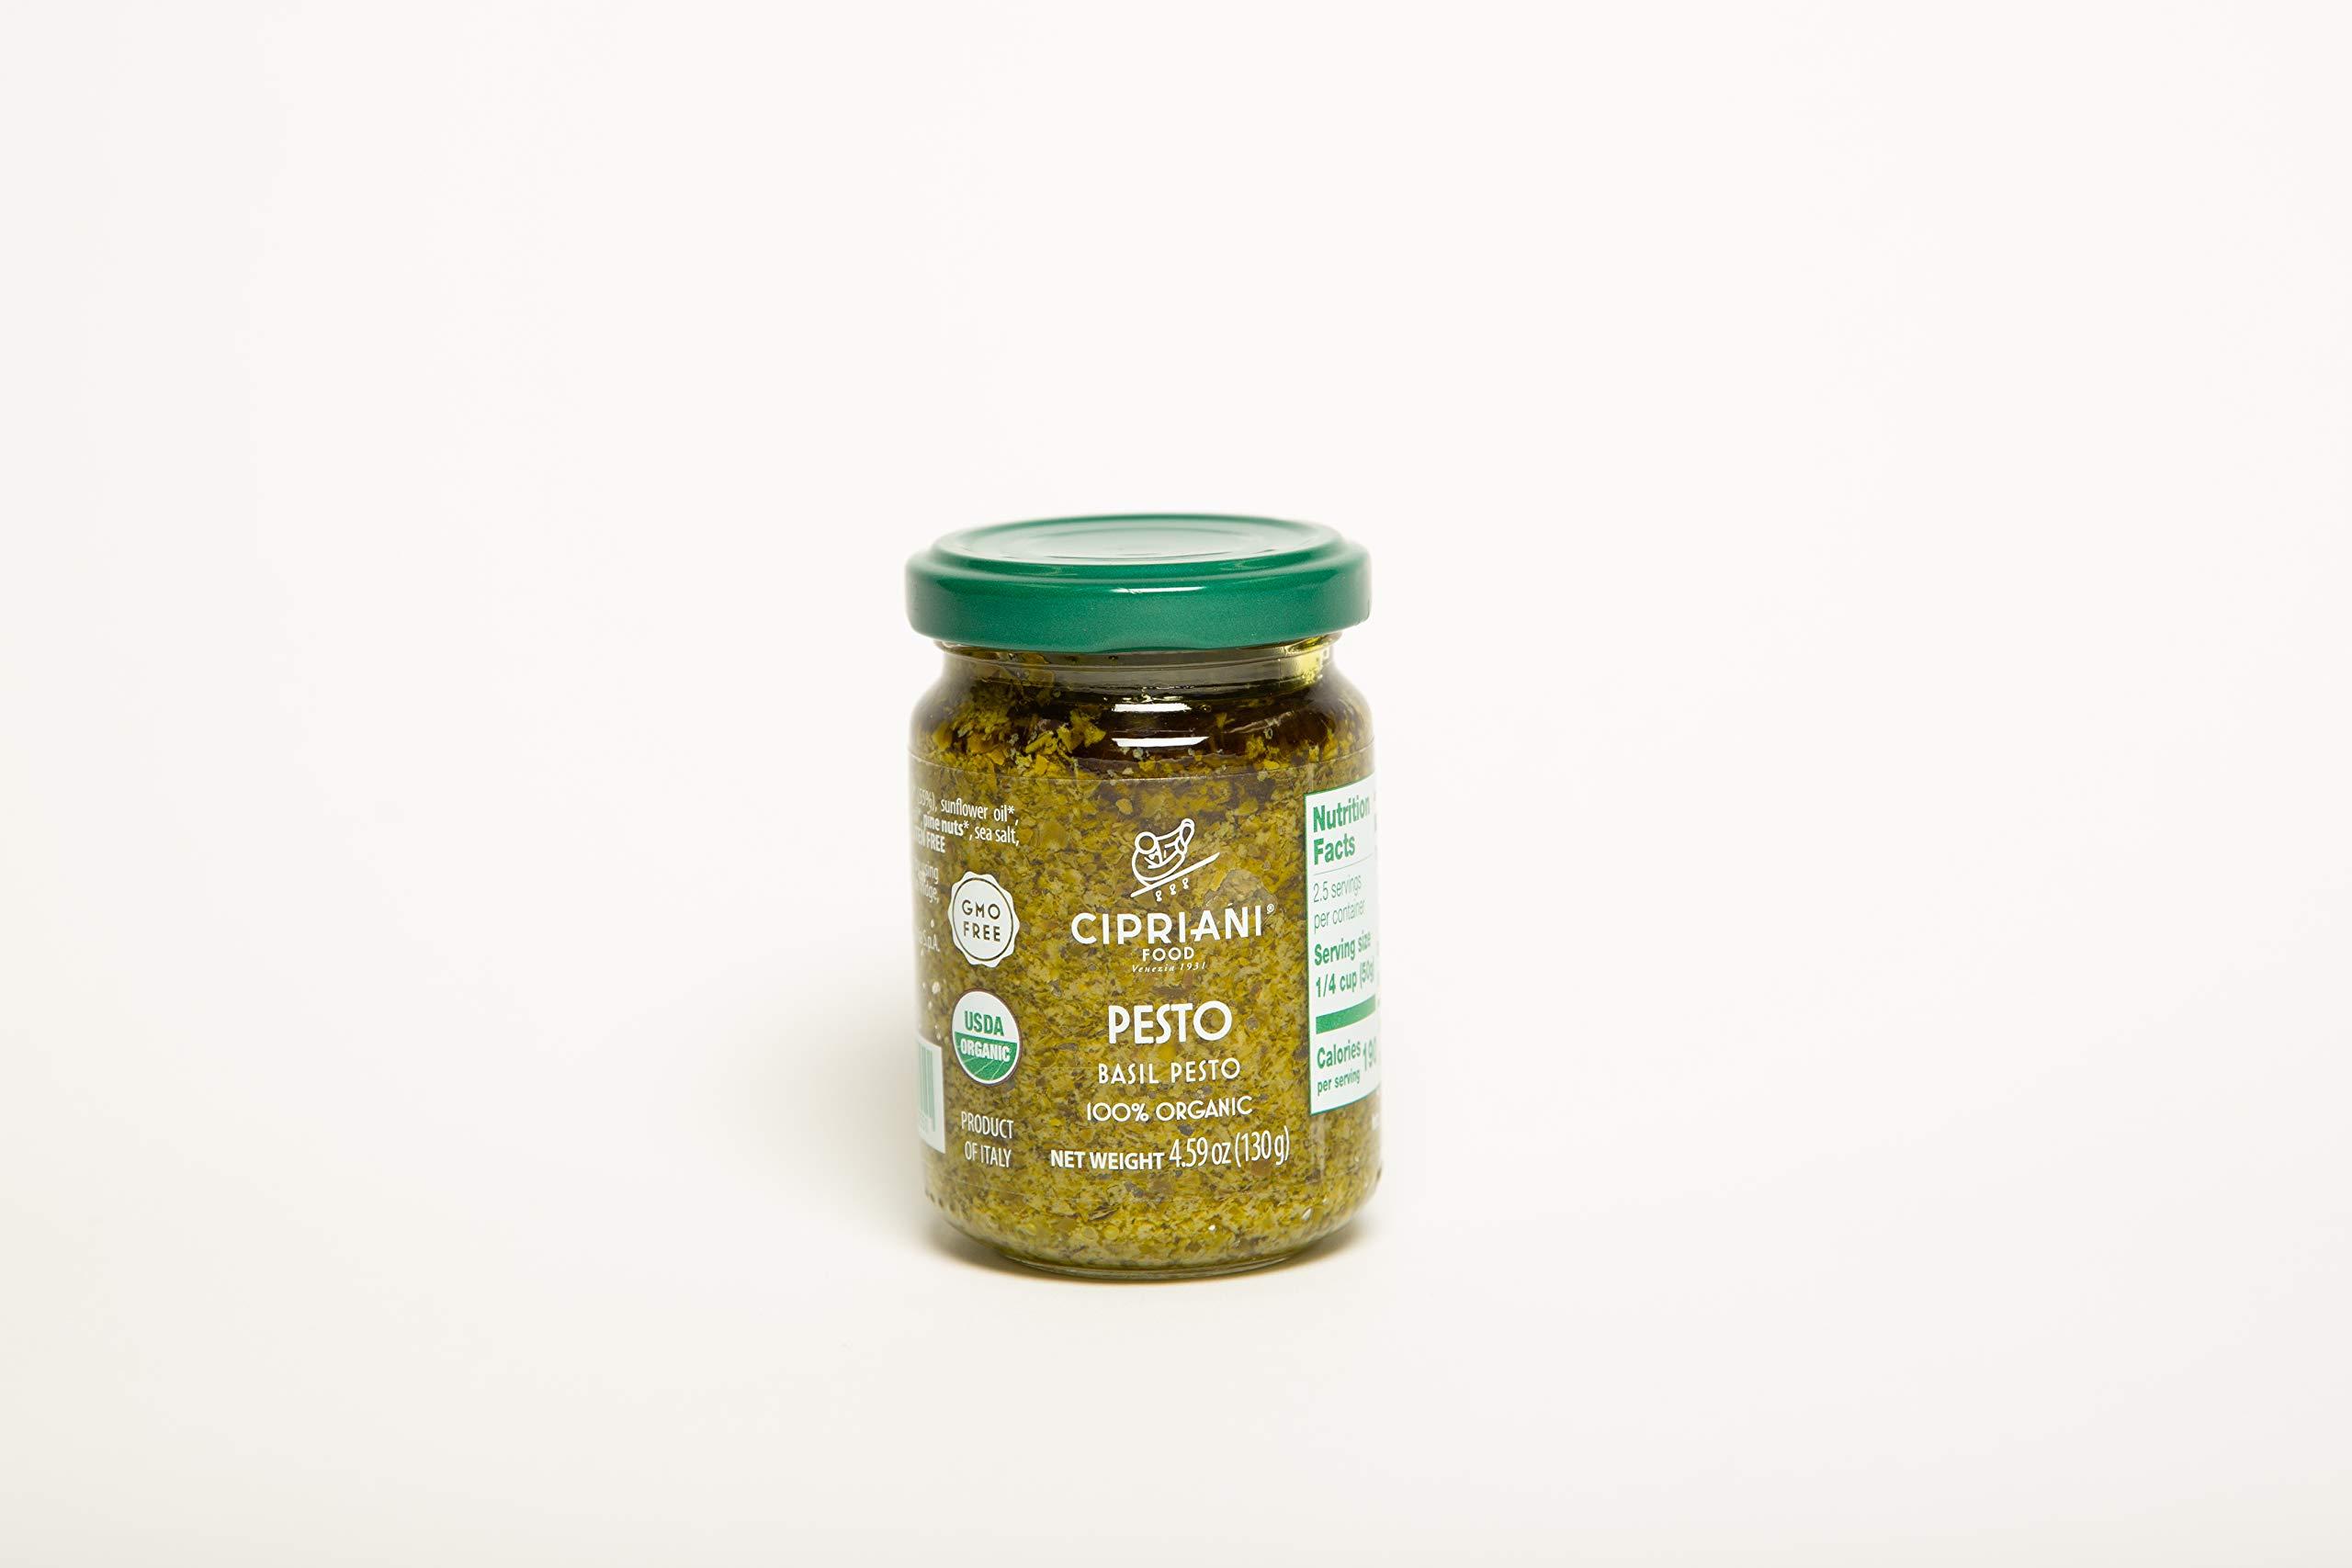 Cipriani Basil Pesto Organic